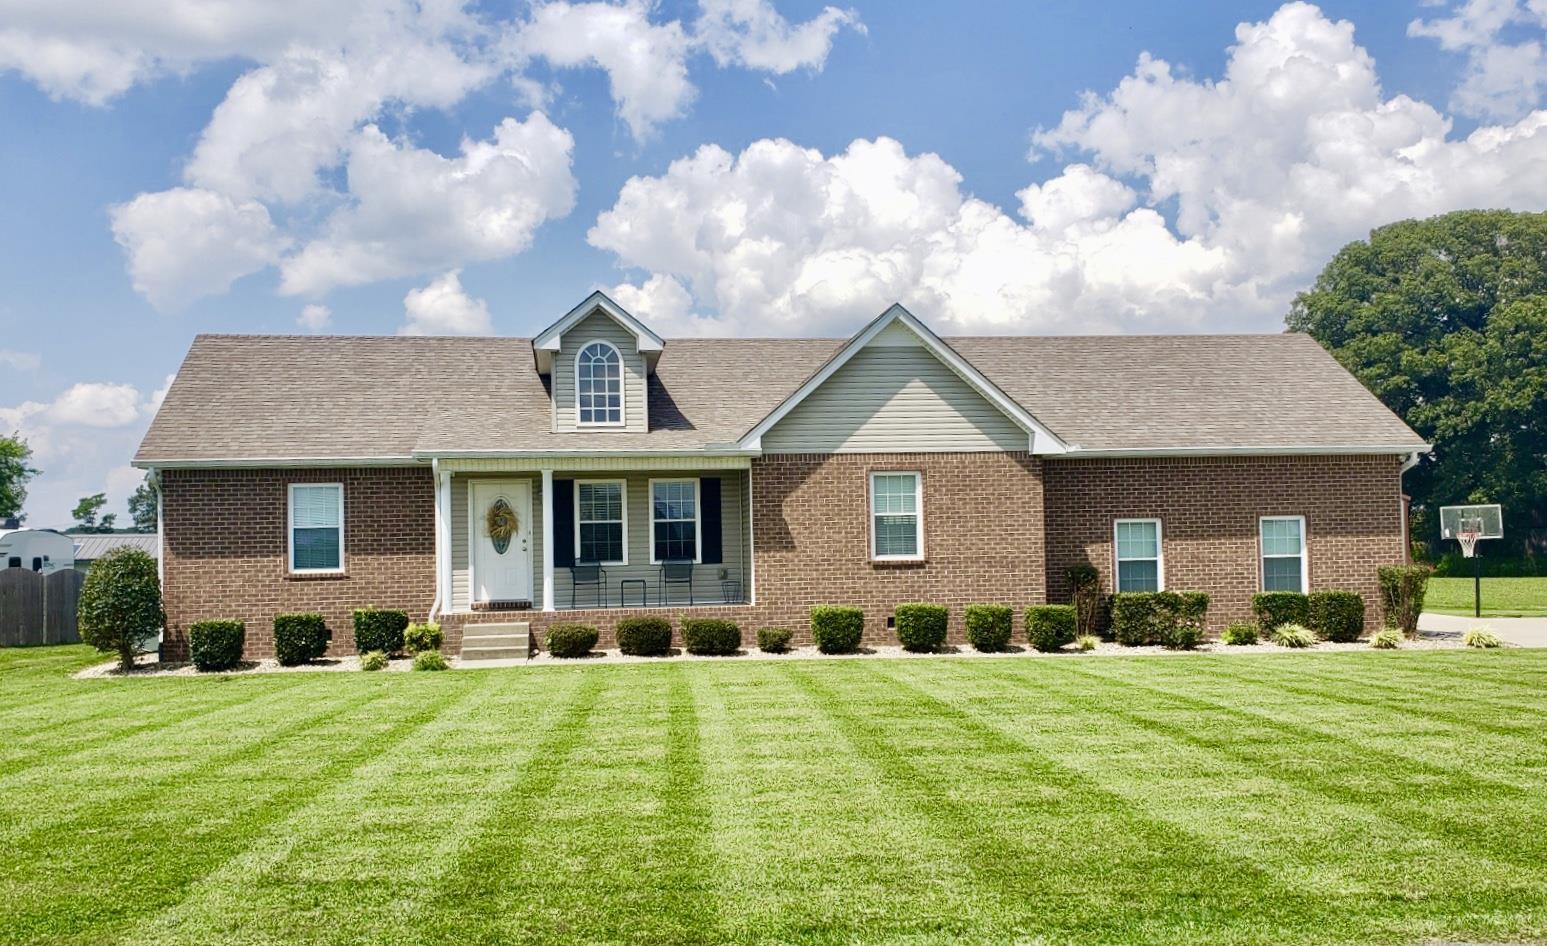 1014 Kimberly Dr, Cross Plains, TN 37049 - Cross Plains, TN real estate listing